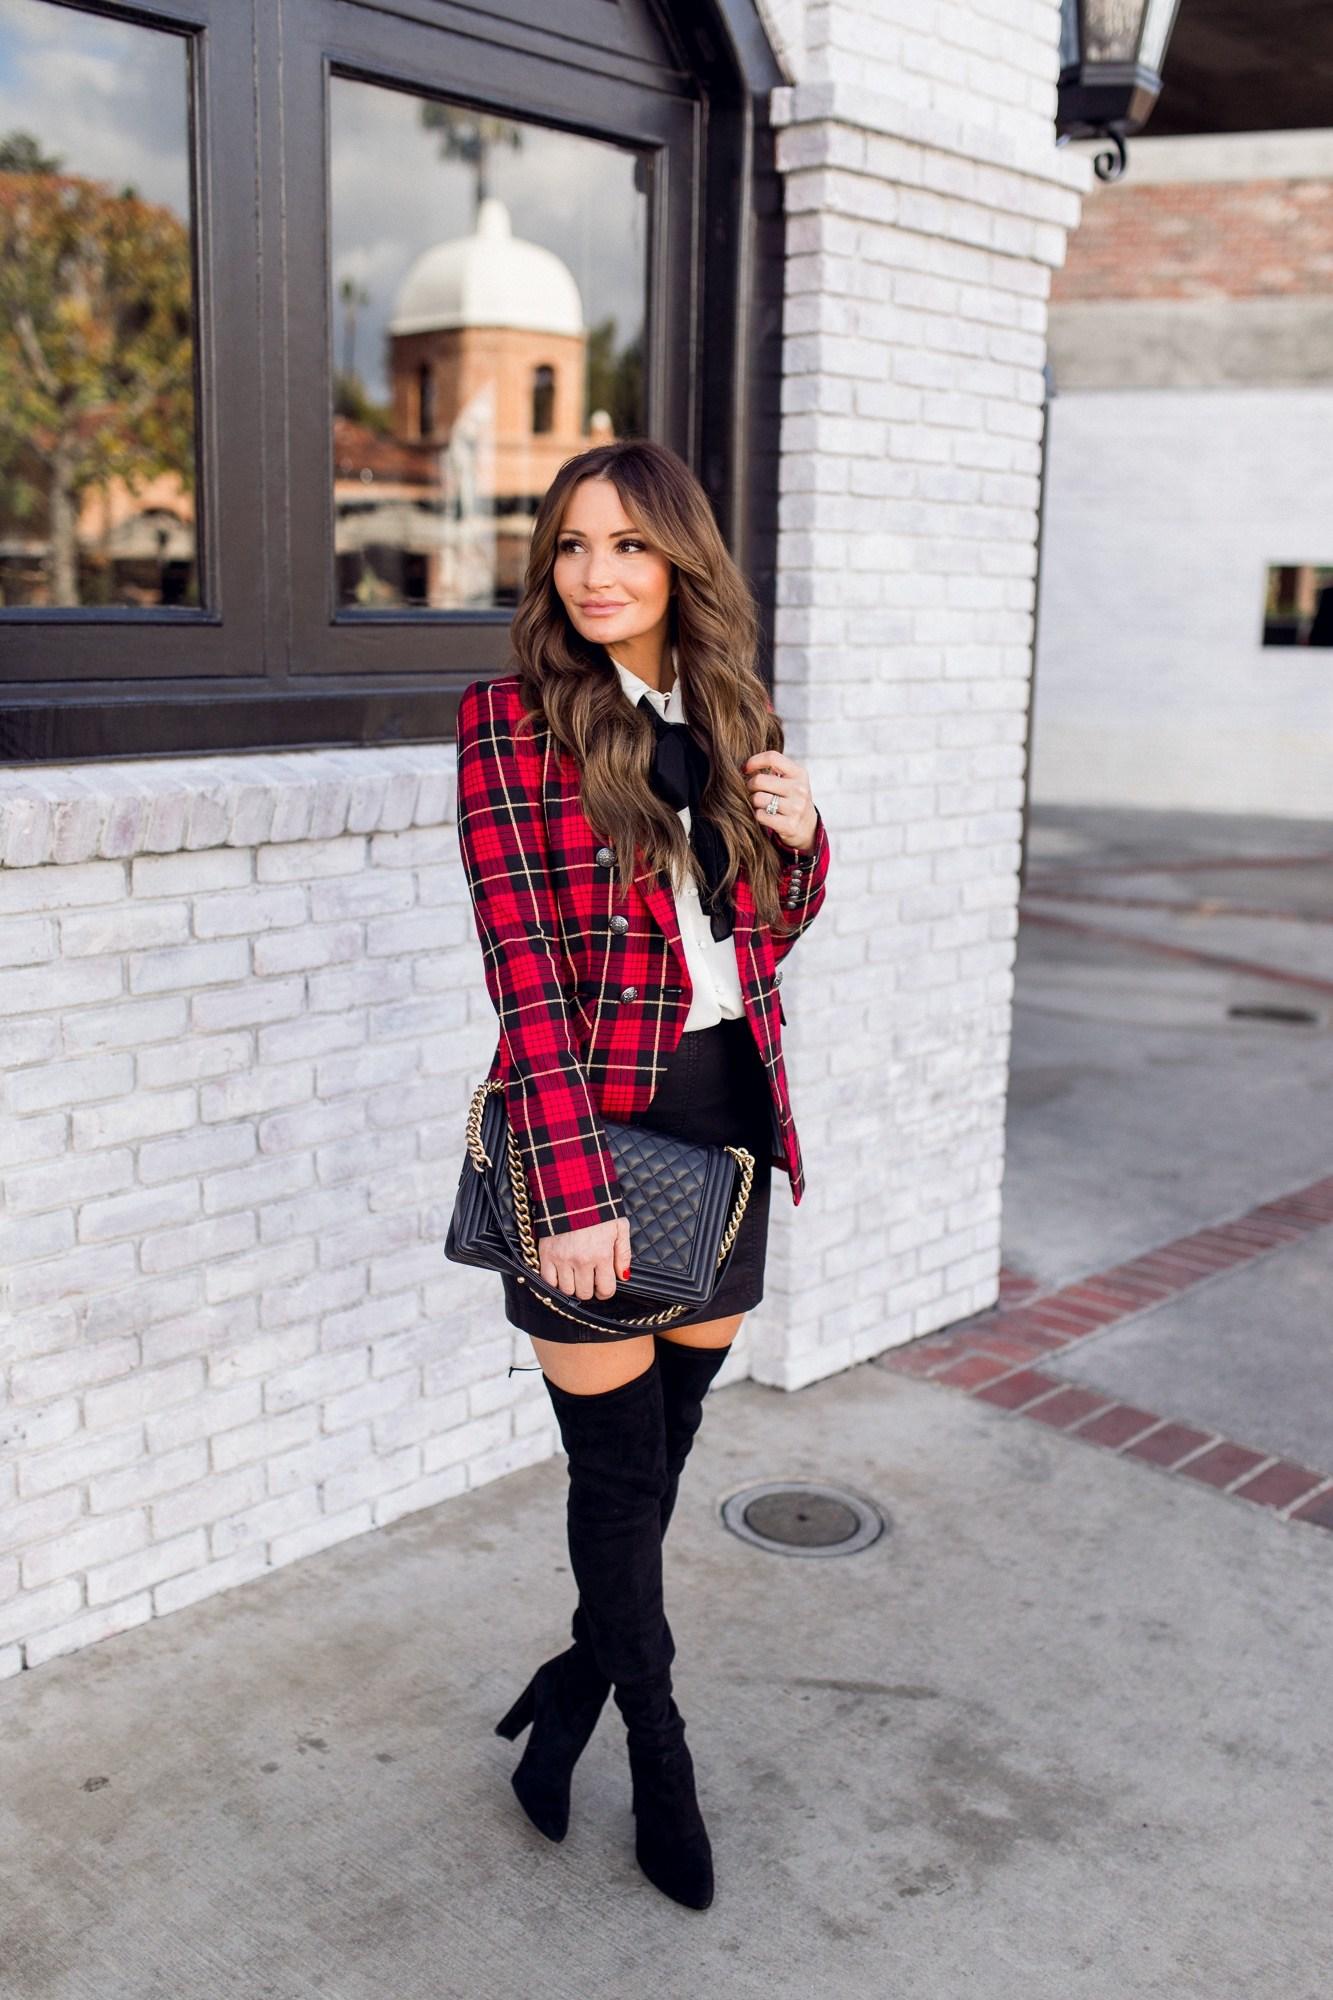 #DKW-Fashion - Holiday Blazers